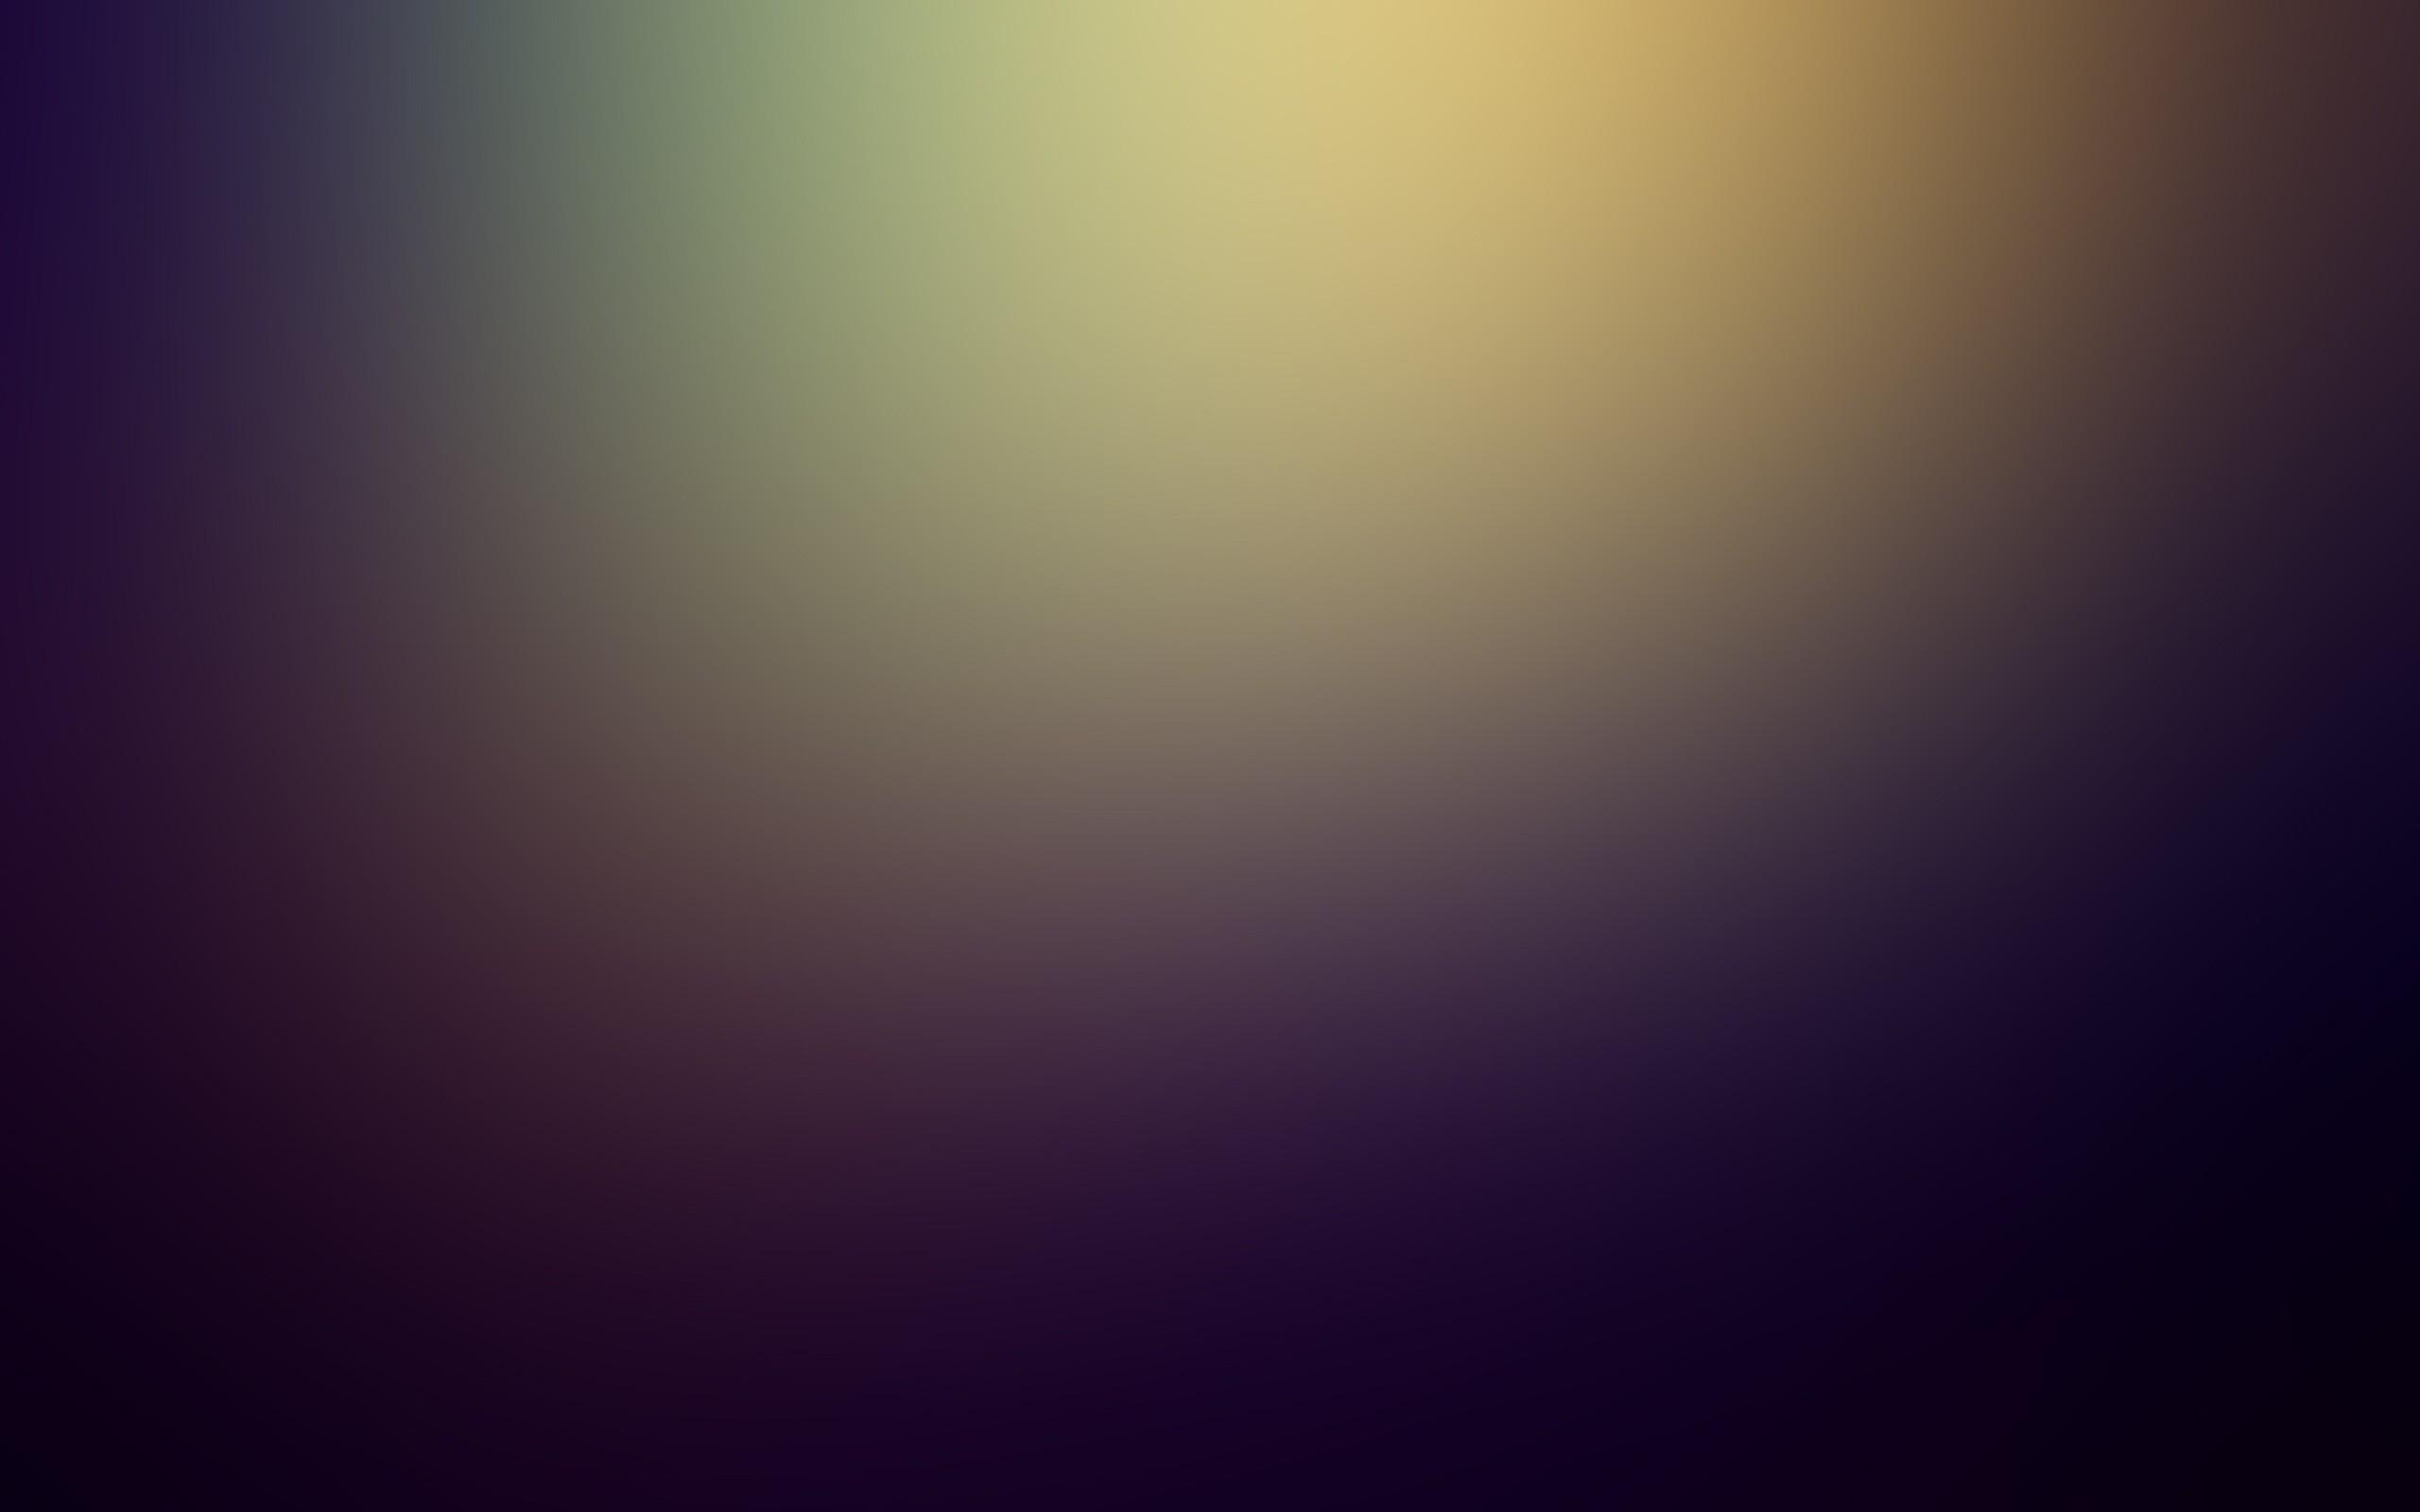 Blurred Wallpapers Wallpaper